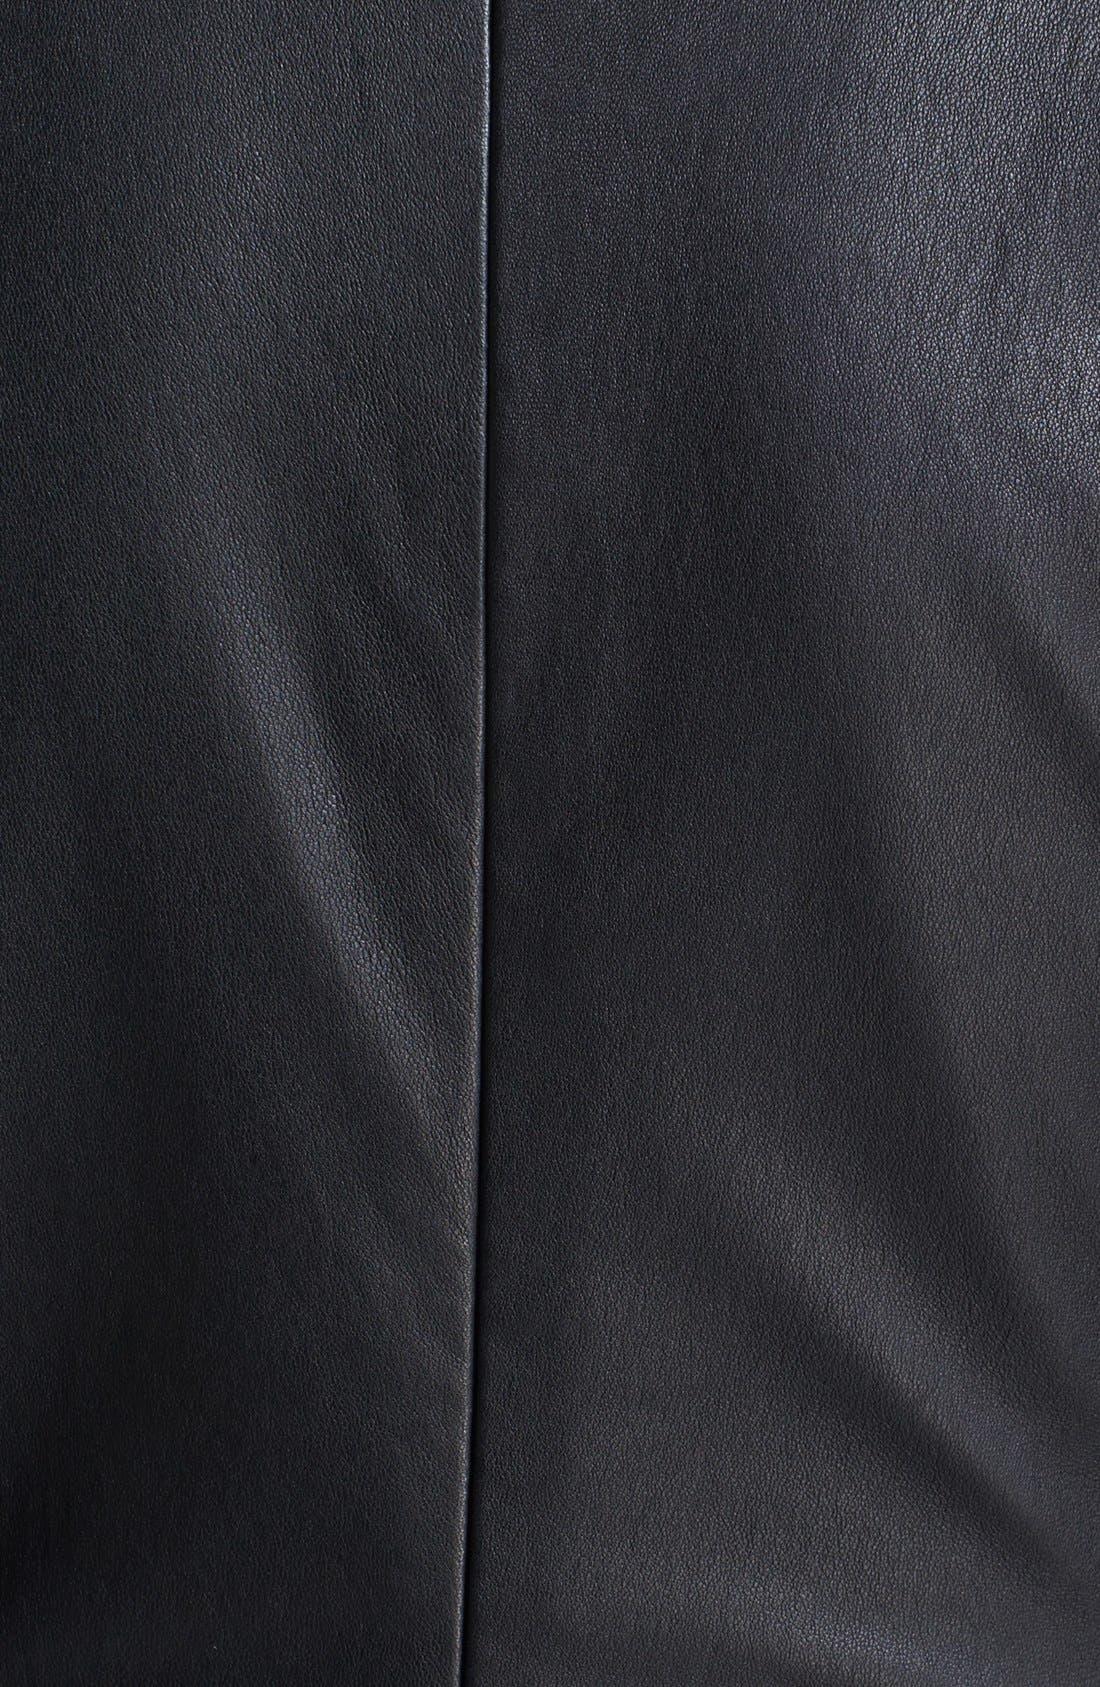 Alternate Image 3  - MARC BY MARC JACOBS 'Lena' Leather Sheath Dress